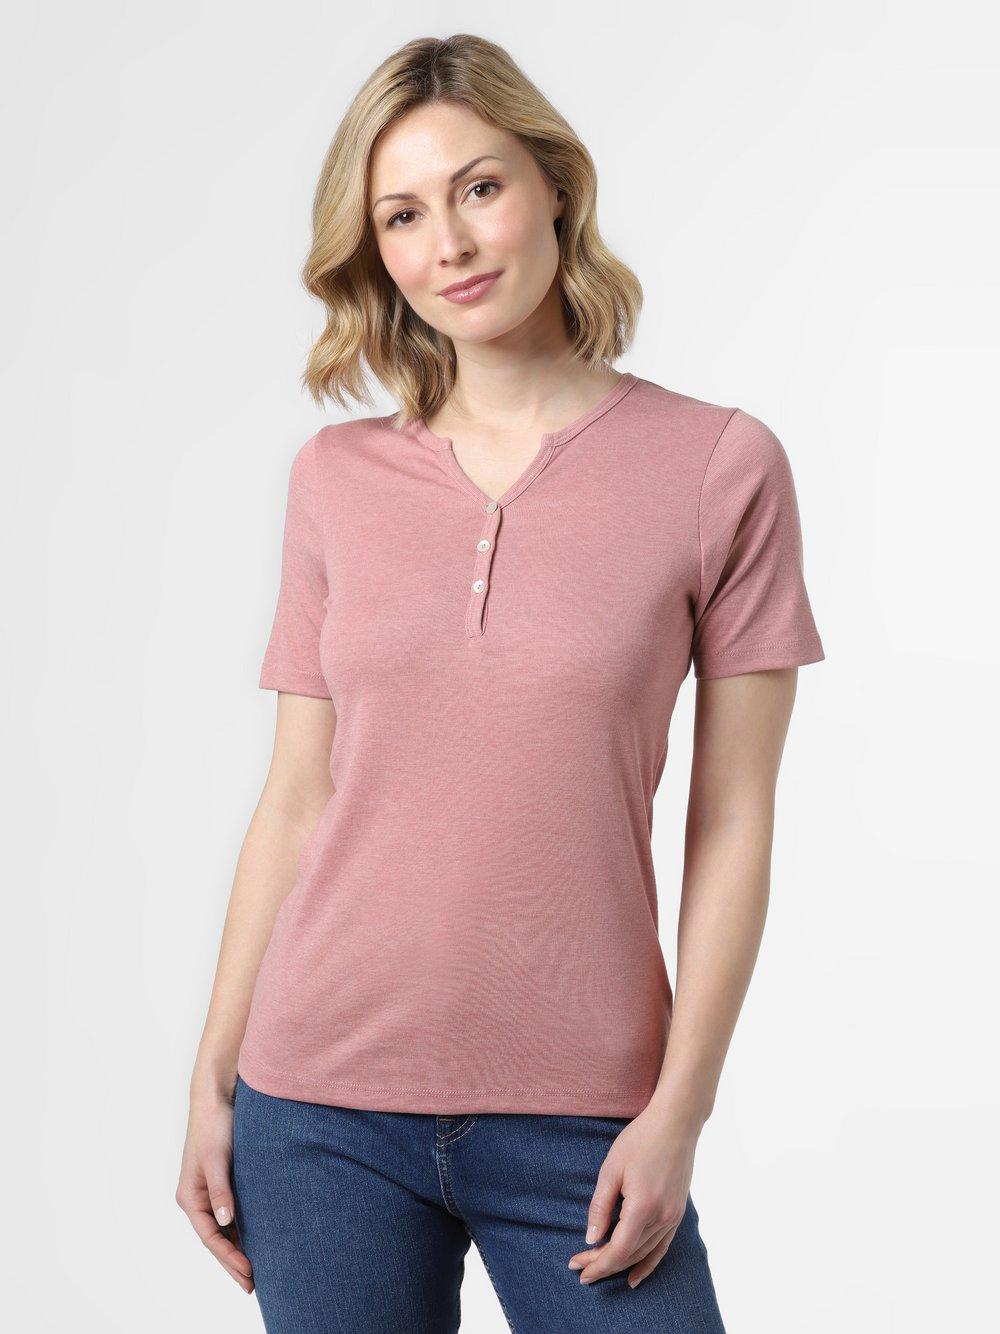 brookshire - T-shirt damski, różowy